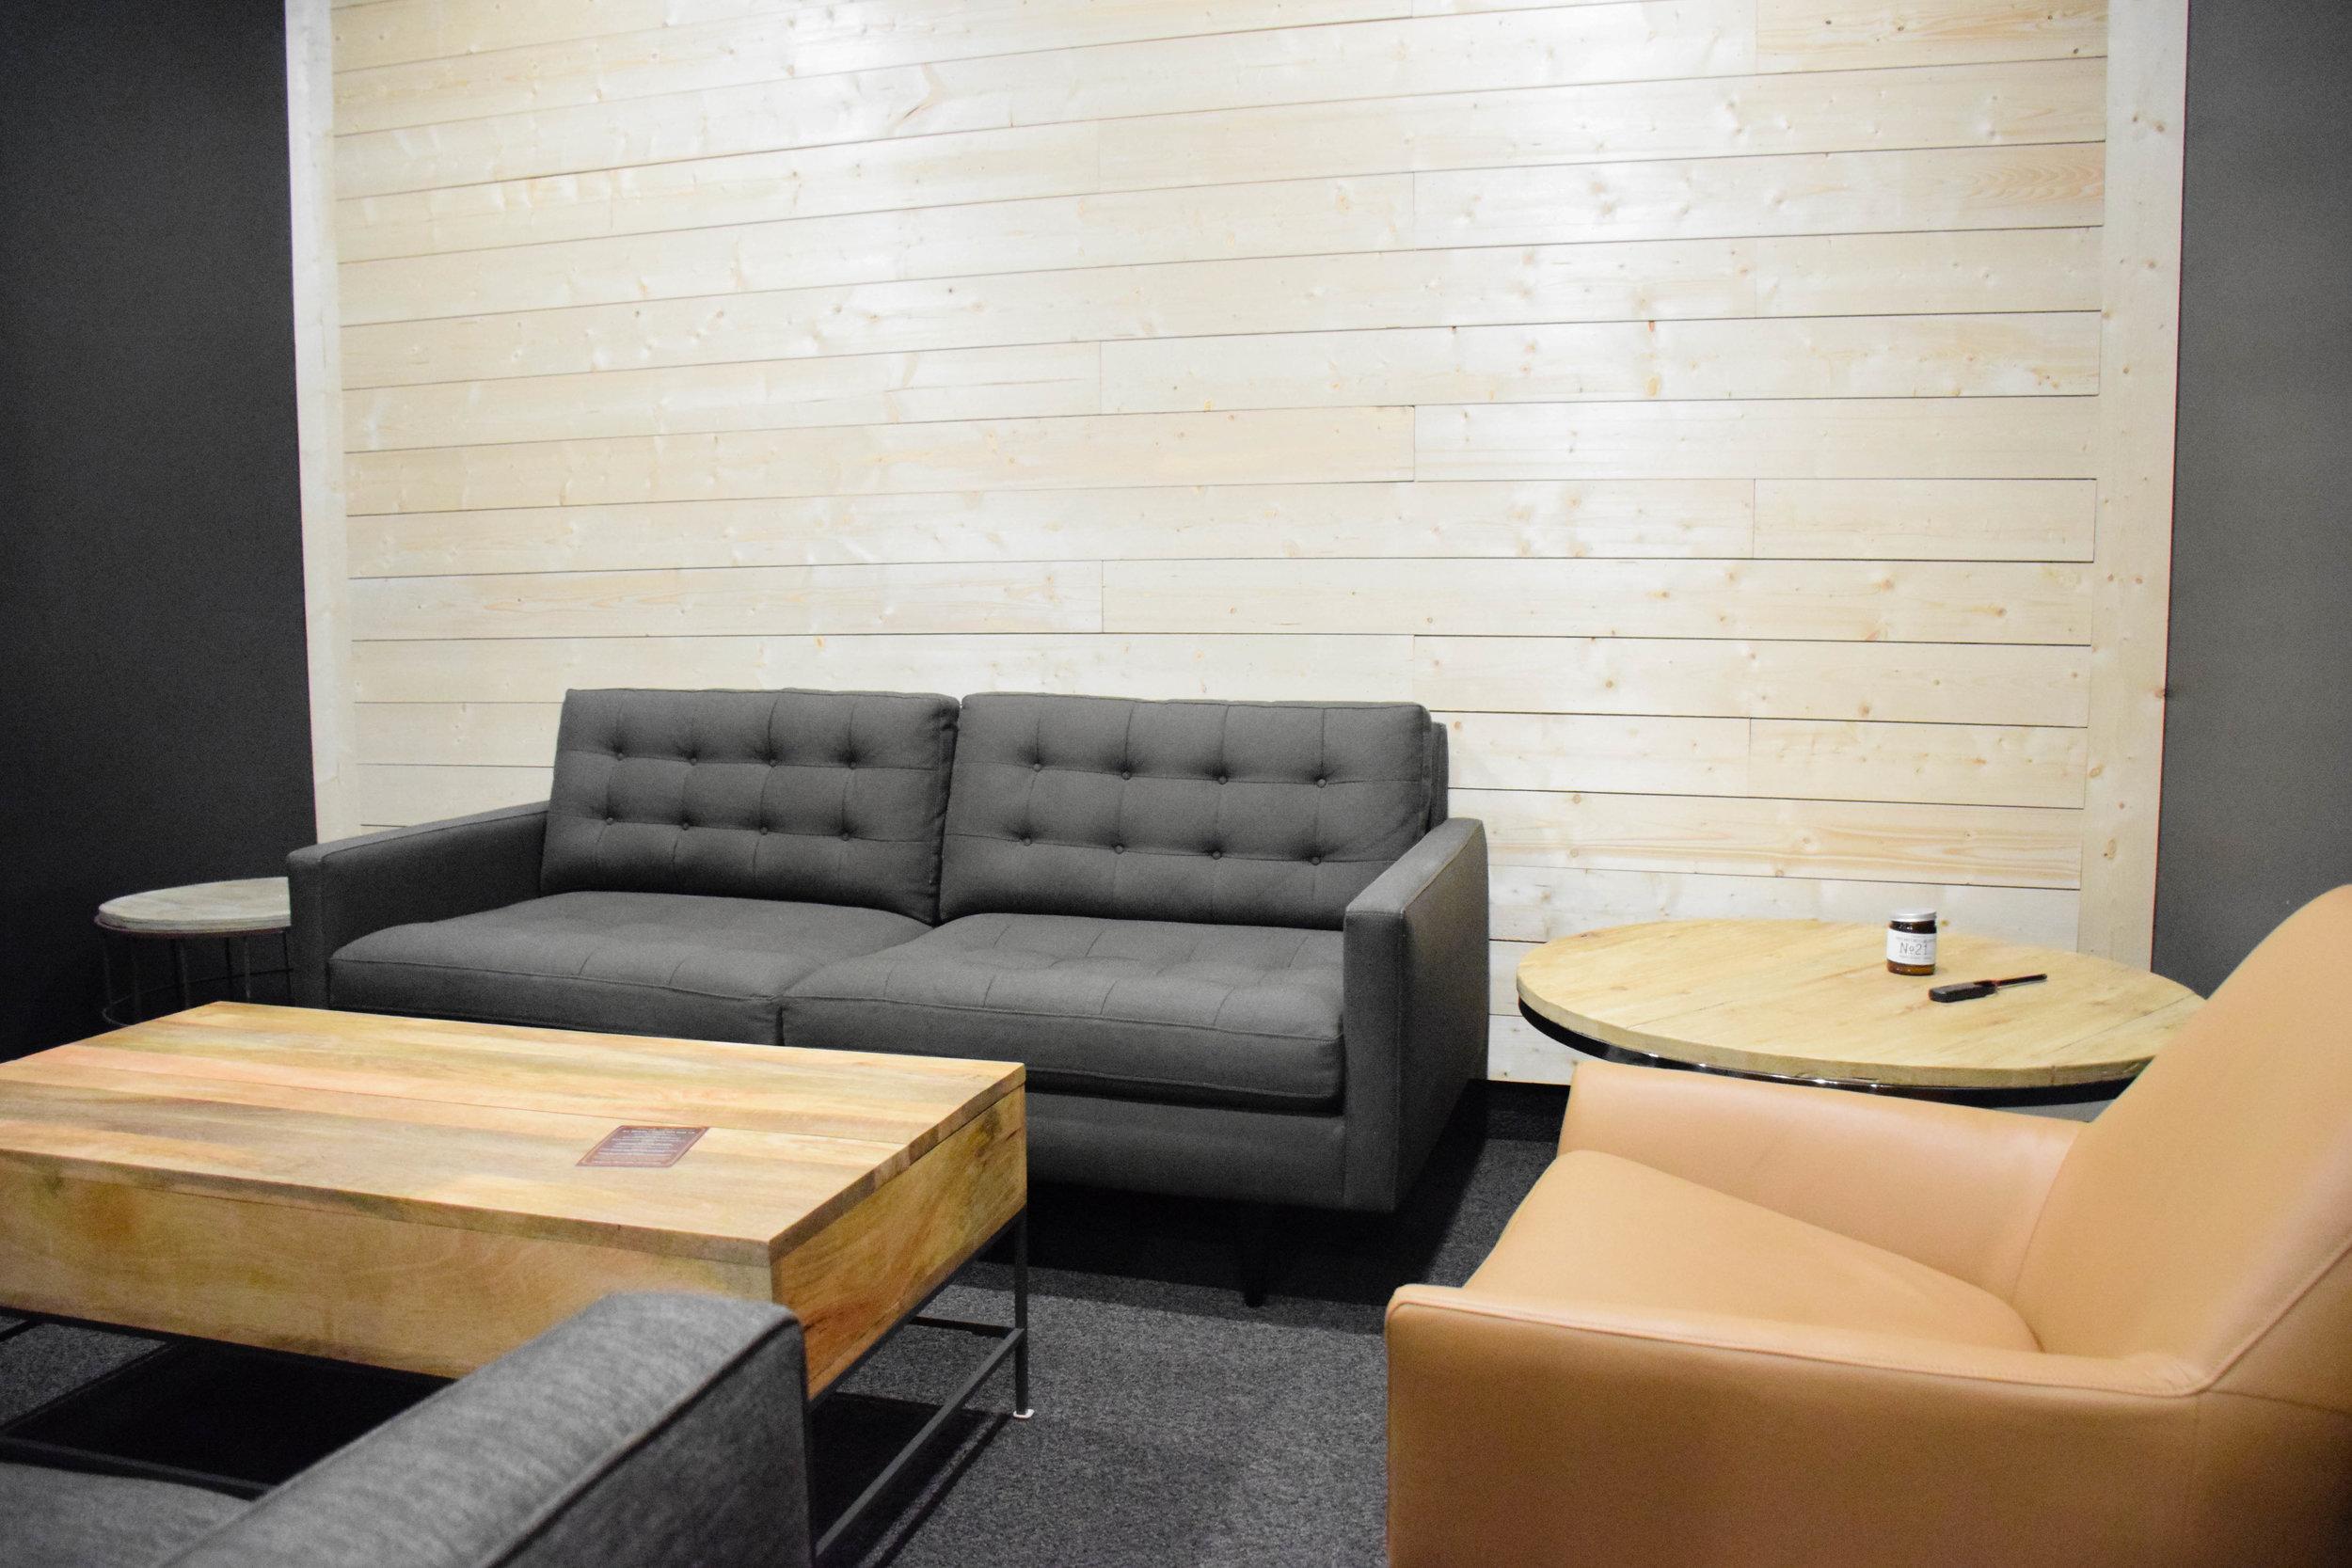 industrial workspace design | pelaia media group-0746-3.jpg